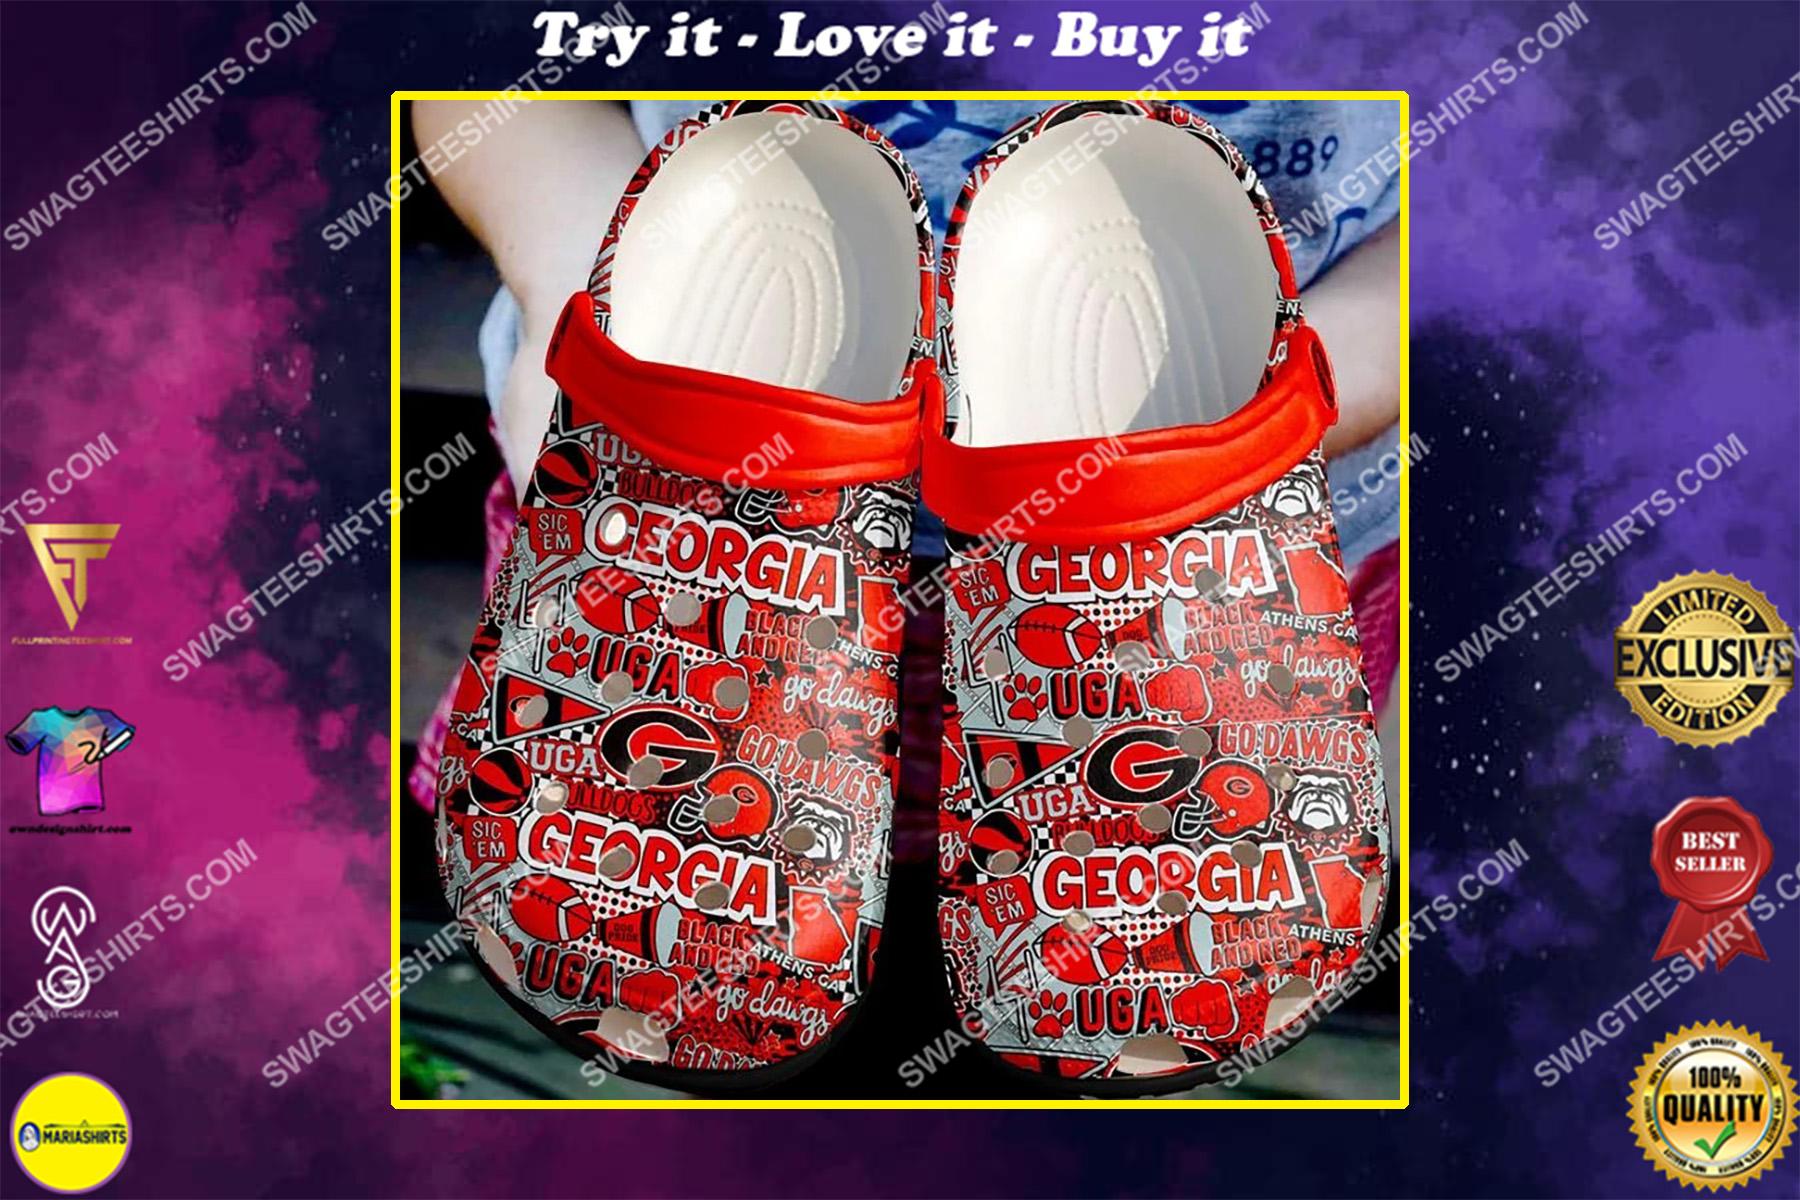 the georgia bulldogs football all over printed crocs crocband clog